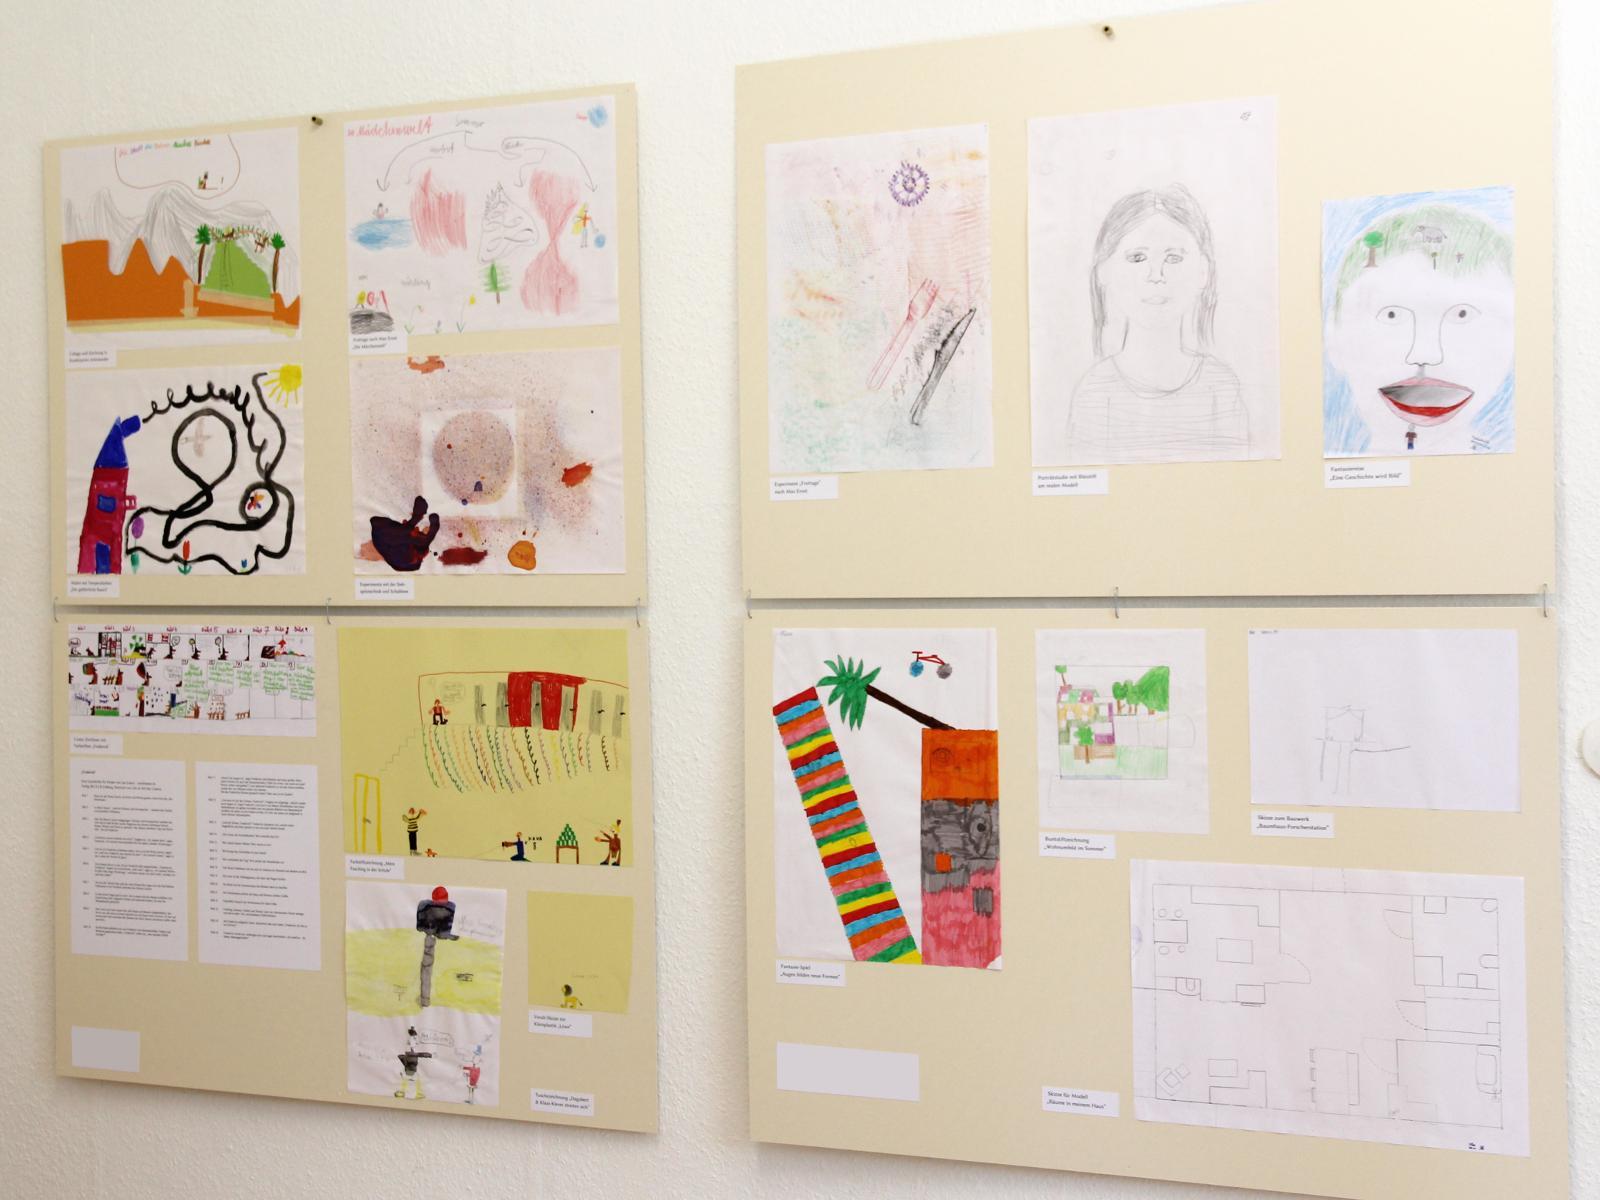 Kunstgespuer Kinderatelier-Ausstellung Betrachtungen 01 Experimente